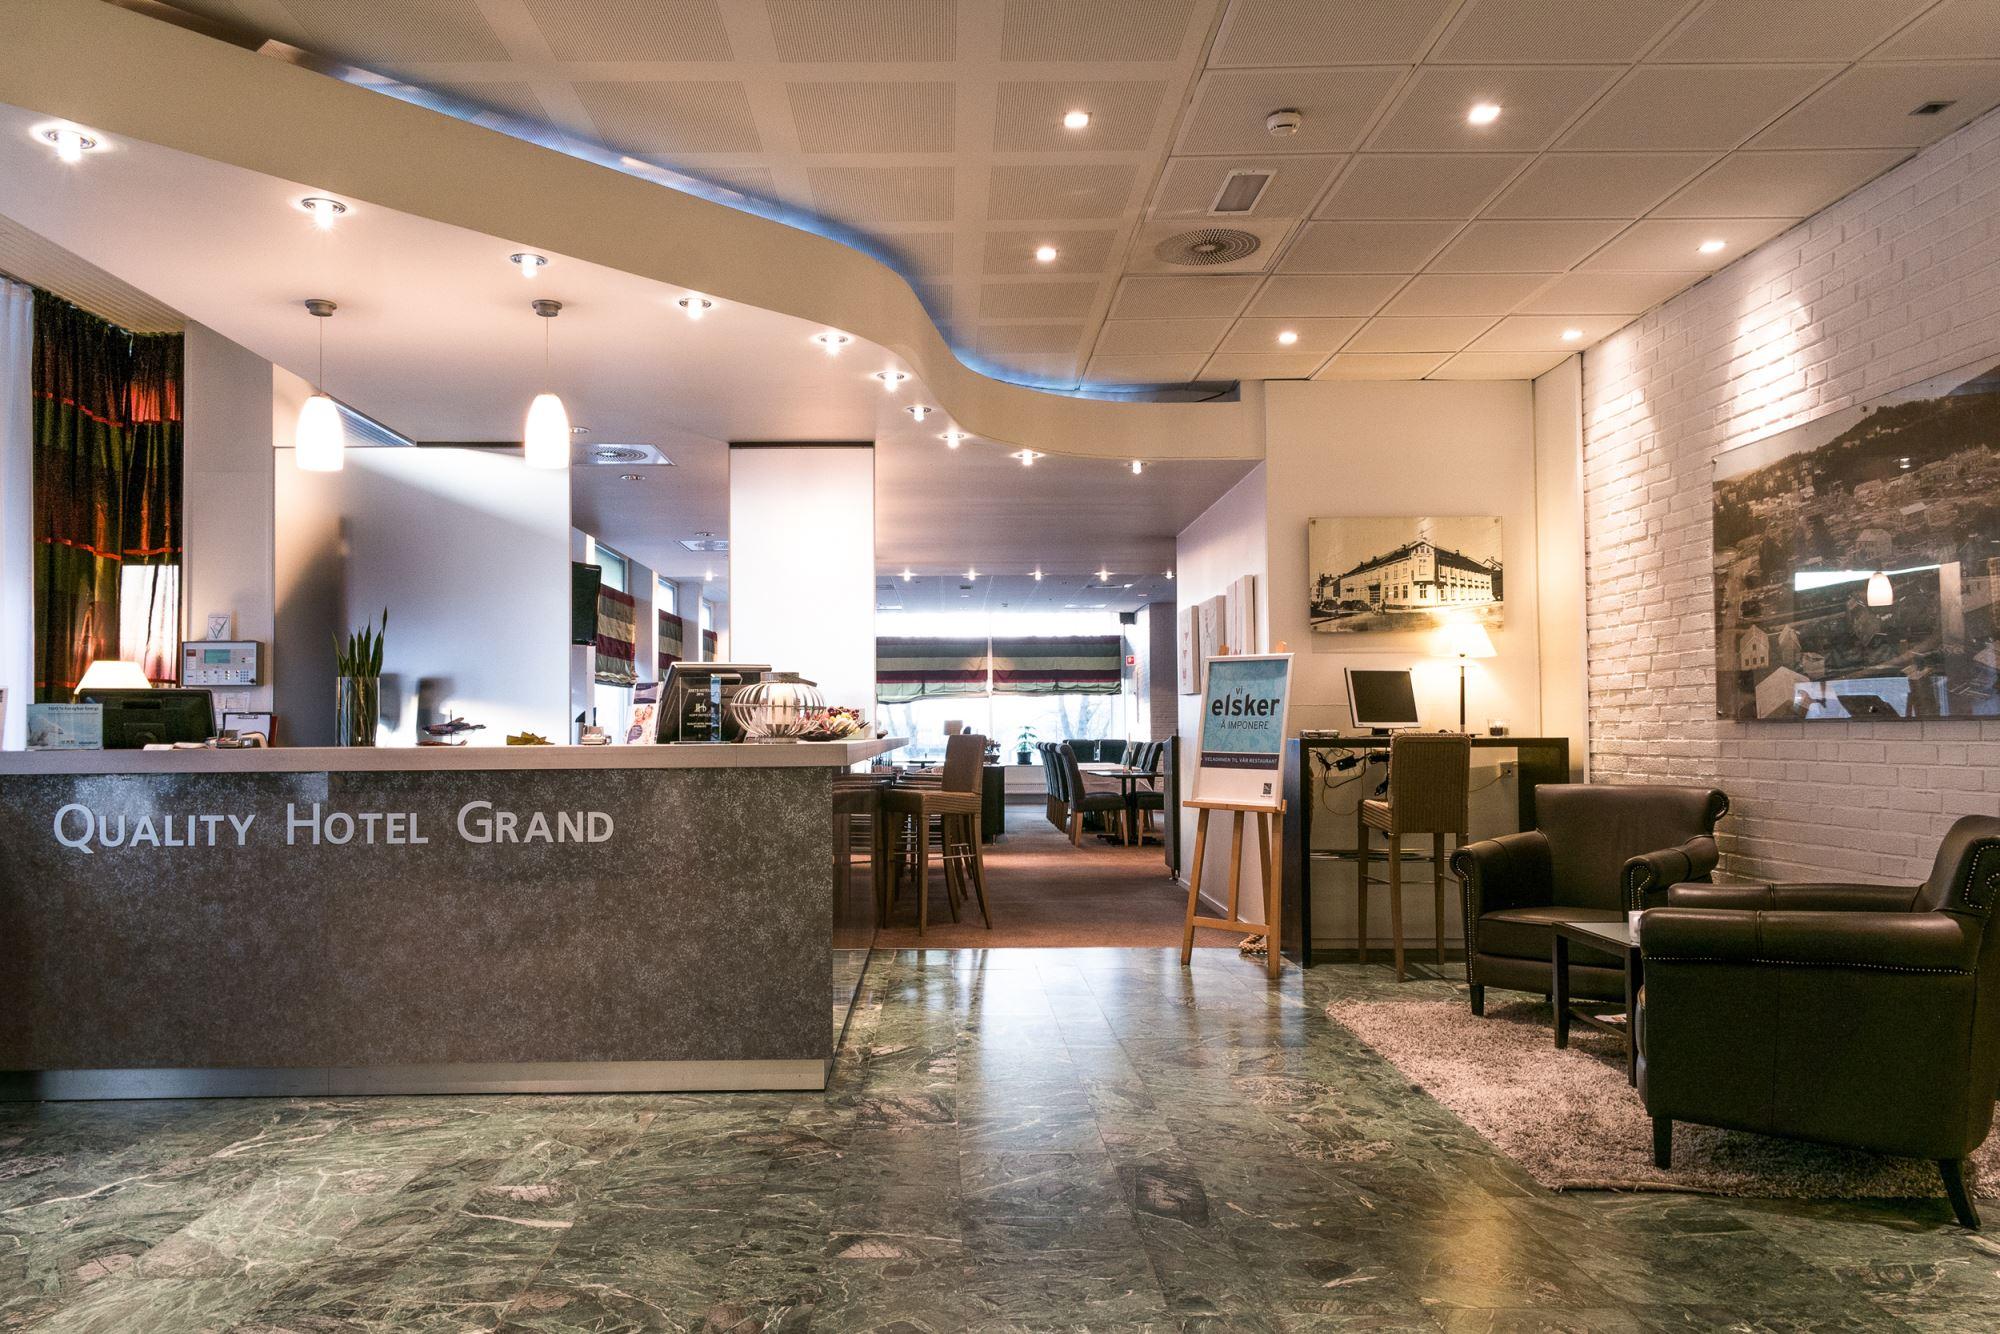 Quality Hotel Grand